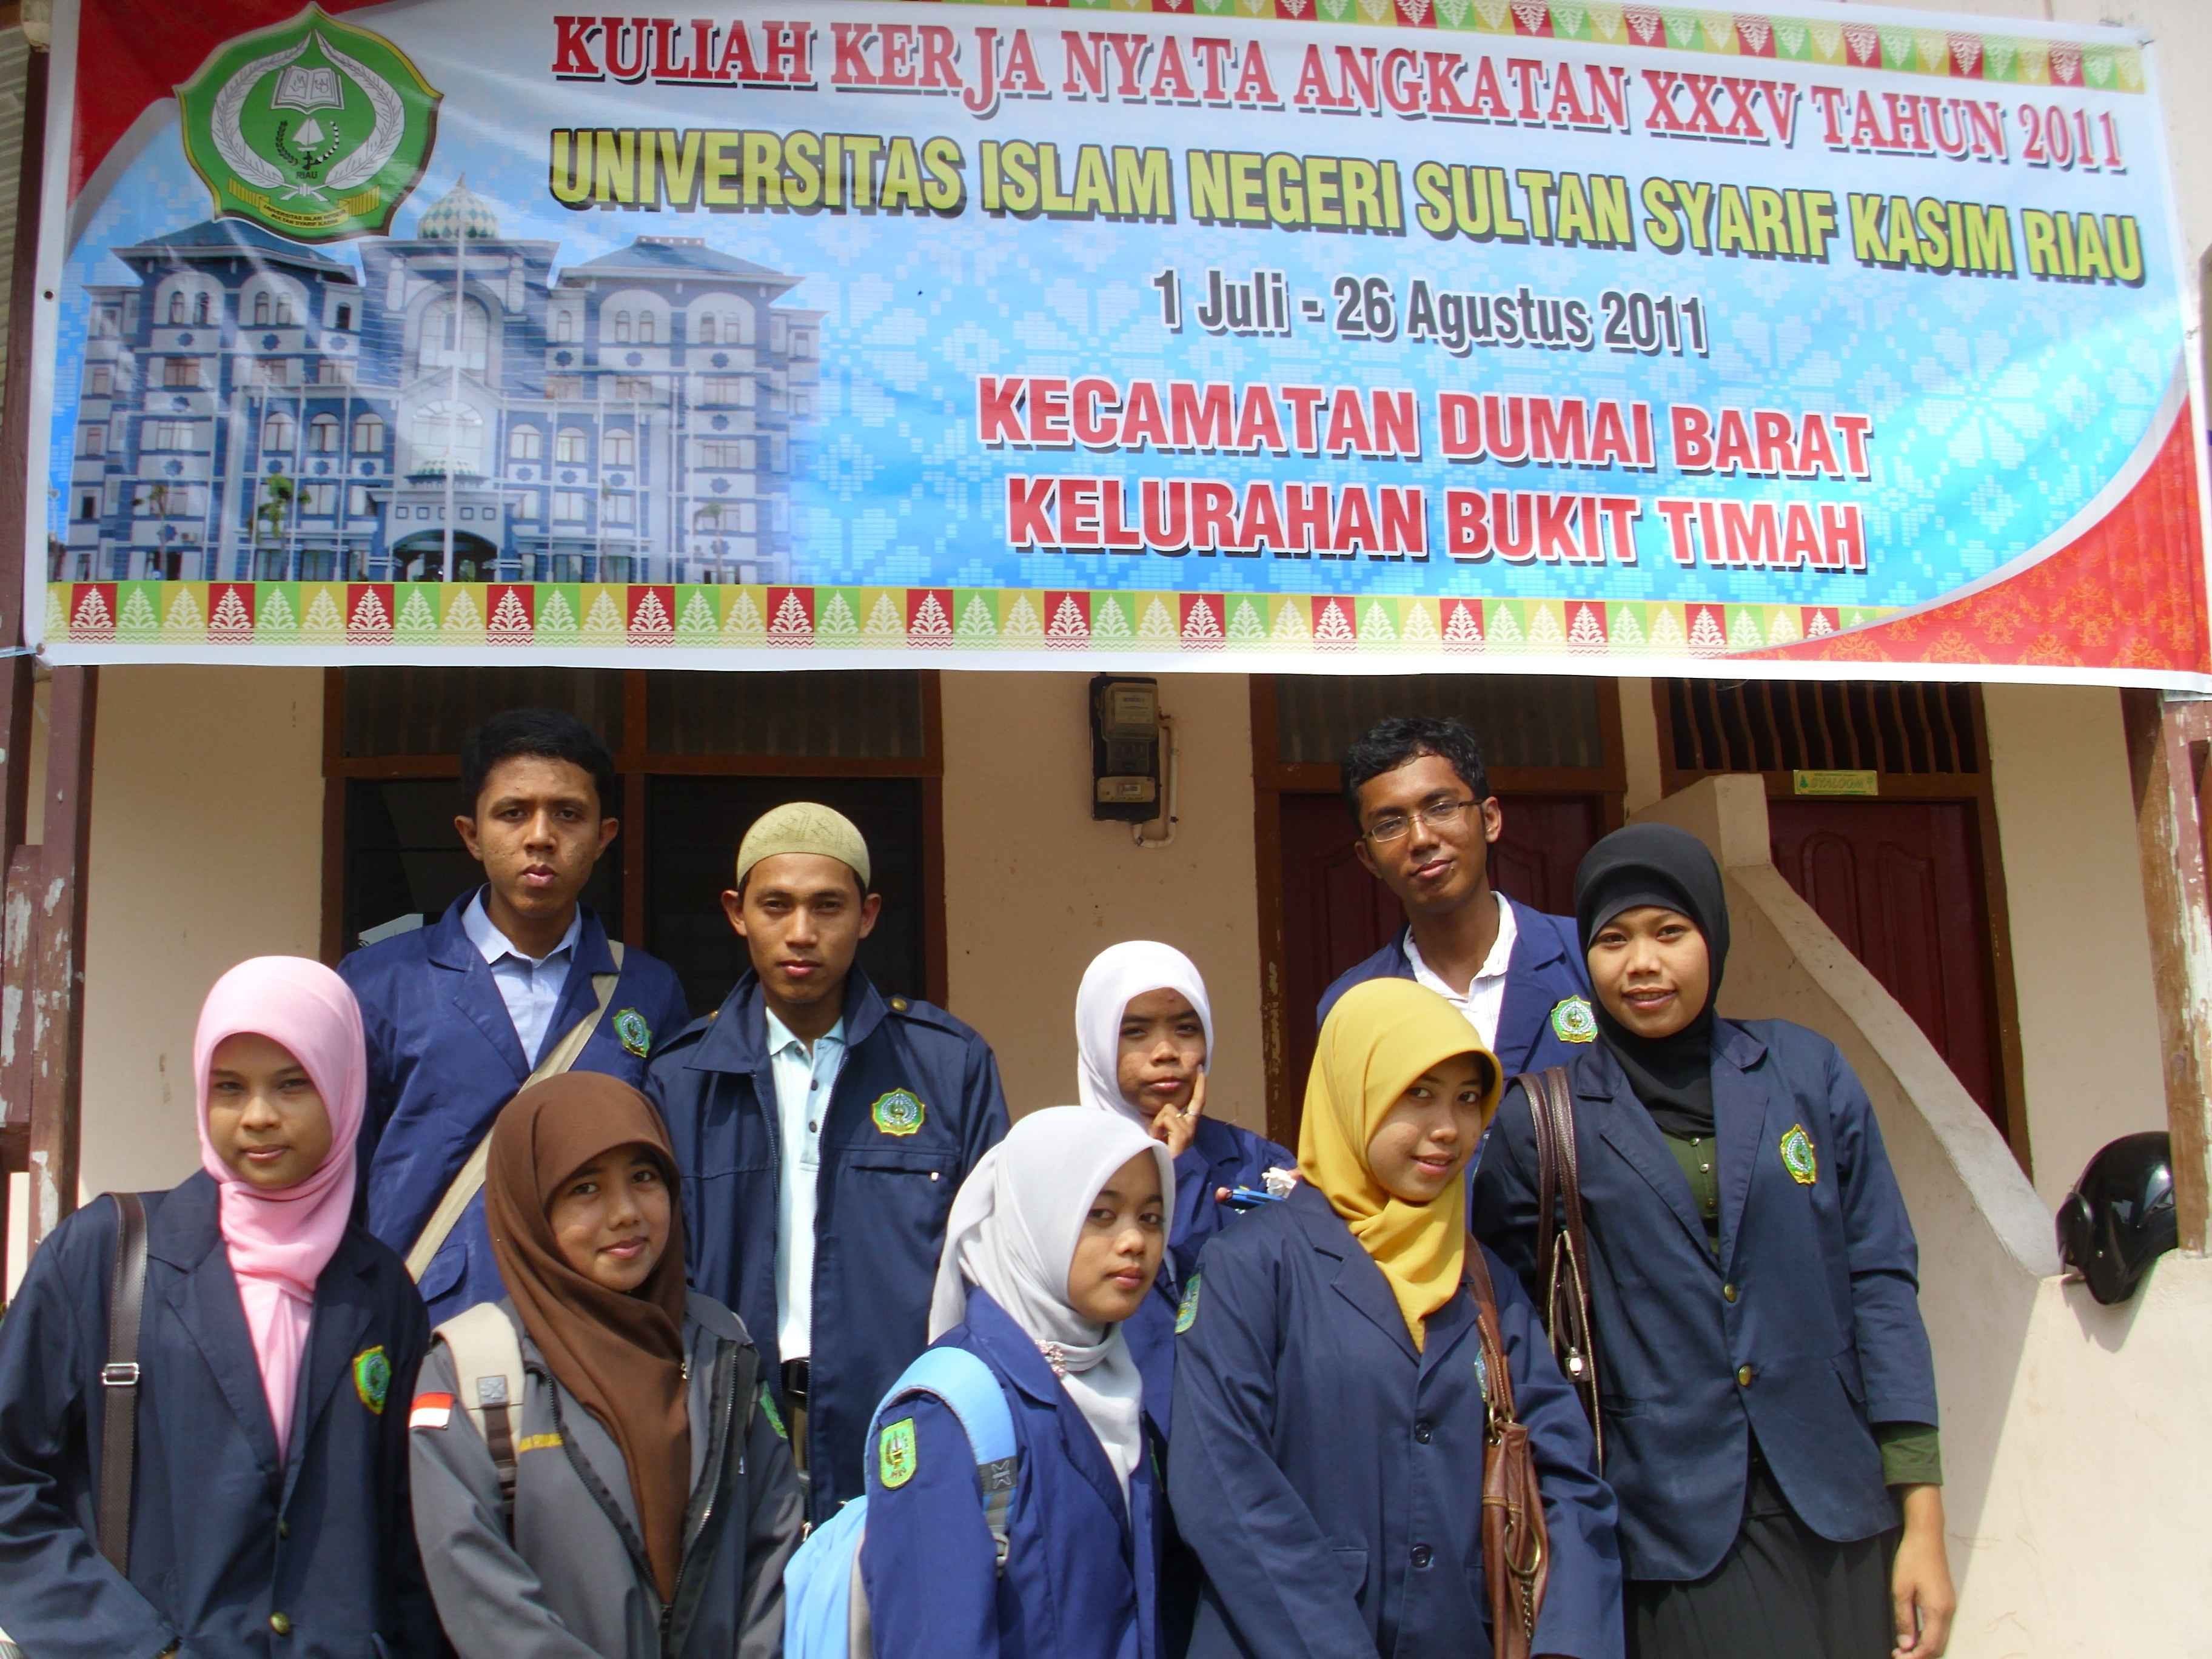 Adhitya bersama teman-teman kelompok KKN di kelurahan Bukit Timah, Dumai Barat